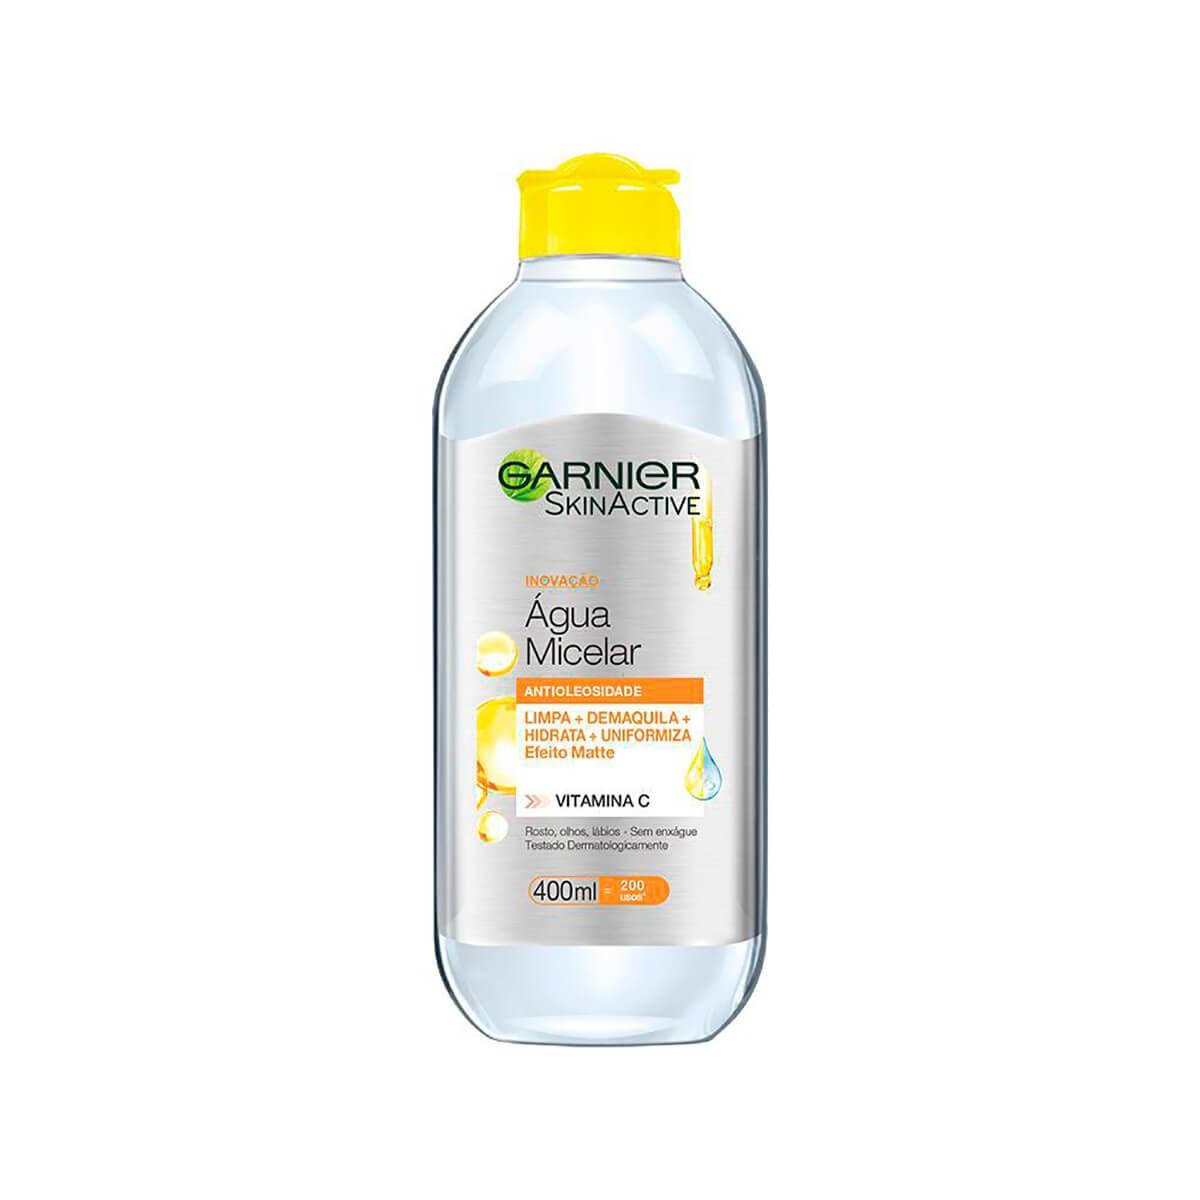 Água Micelar Garnier SkinActive Antioleosidade 400ml